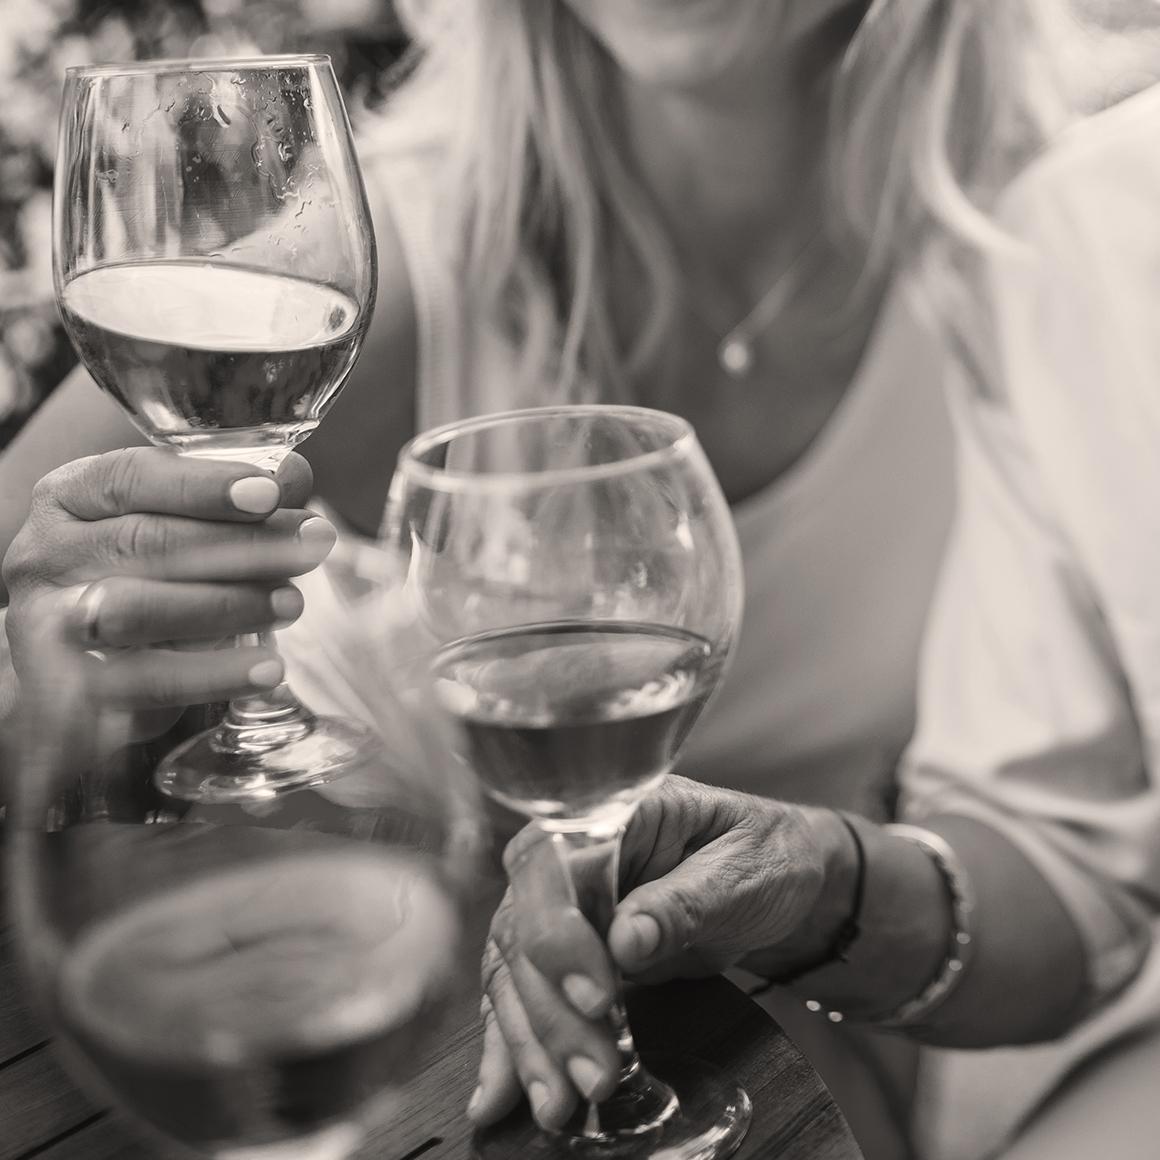 Women holding wine glasses | Creekstone Village